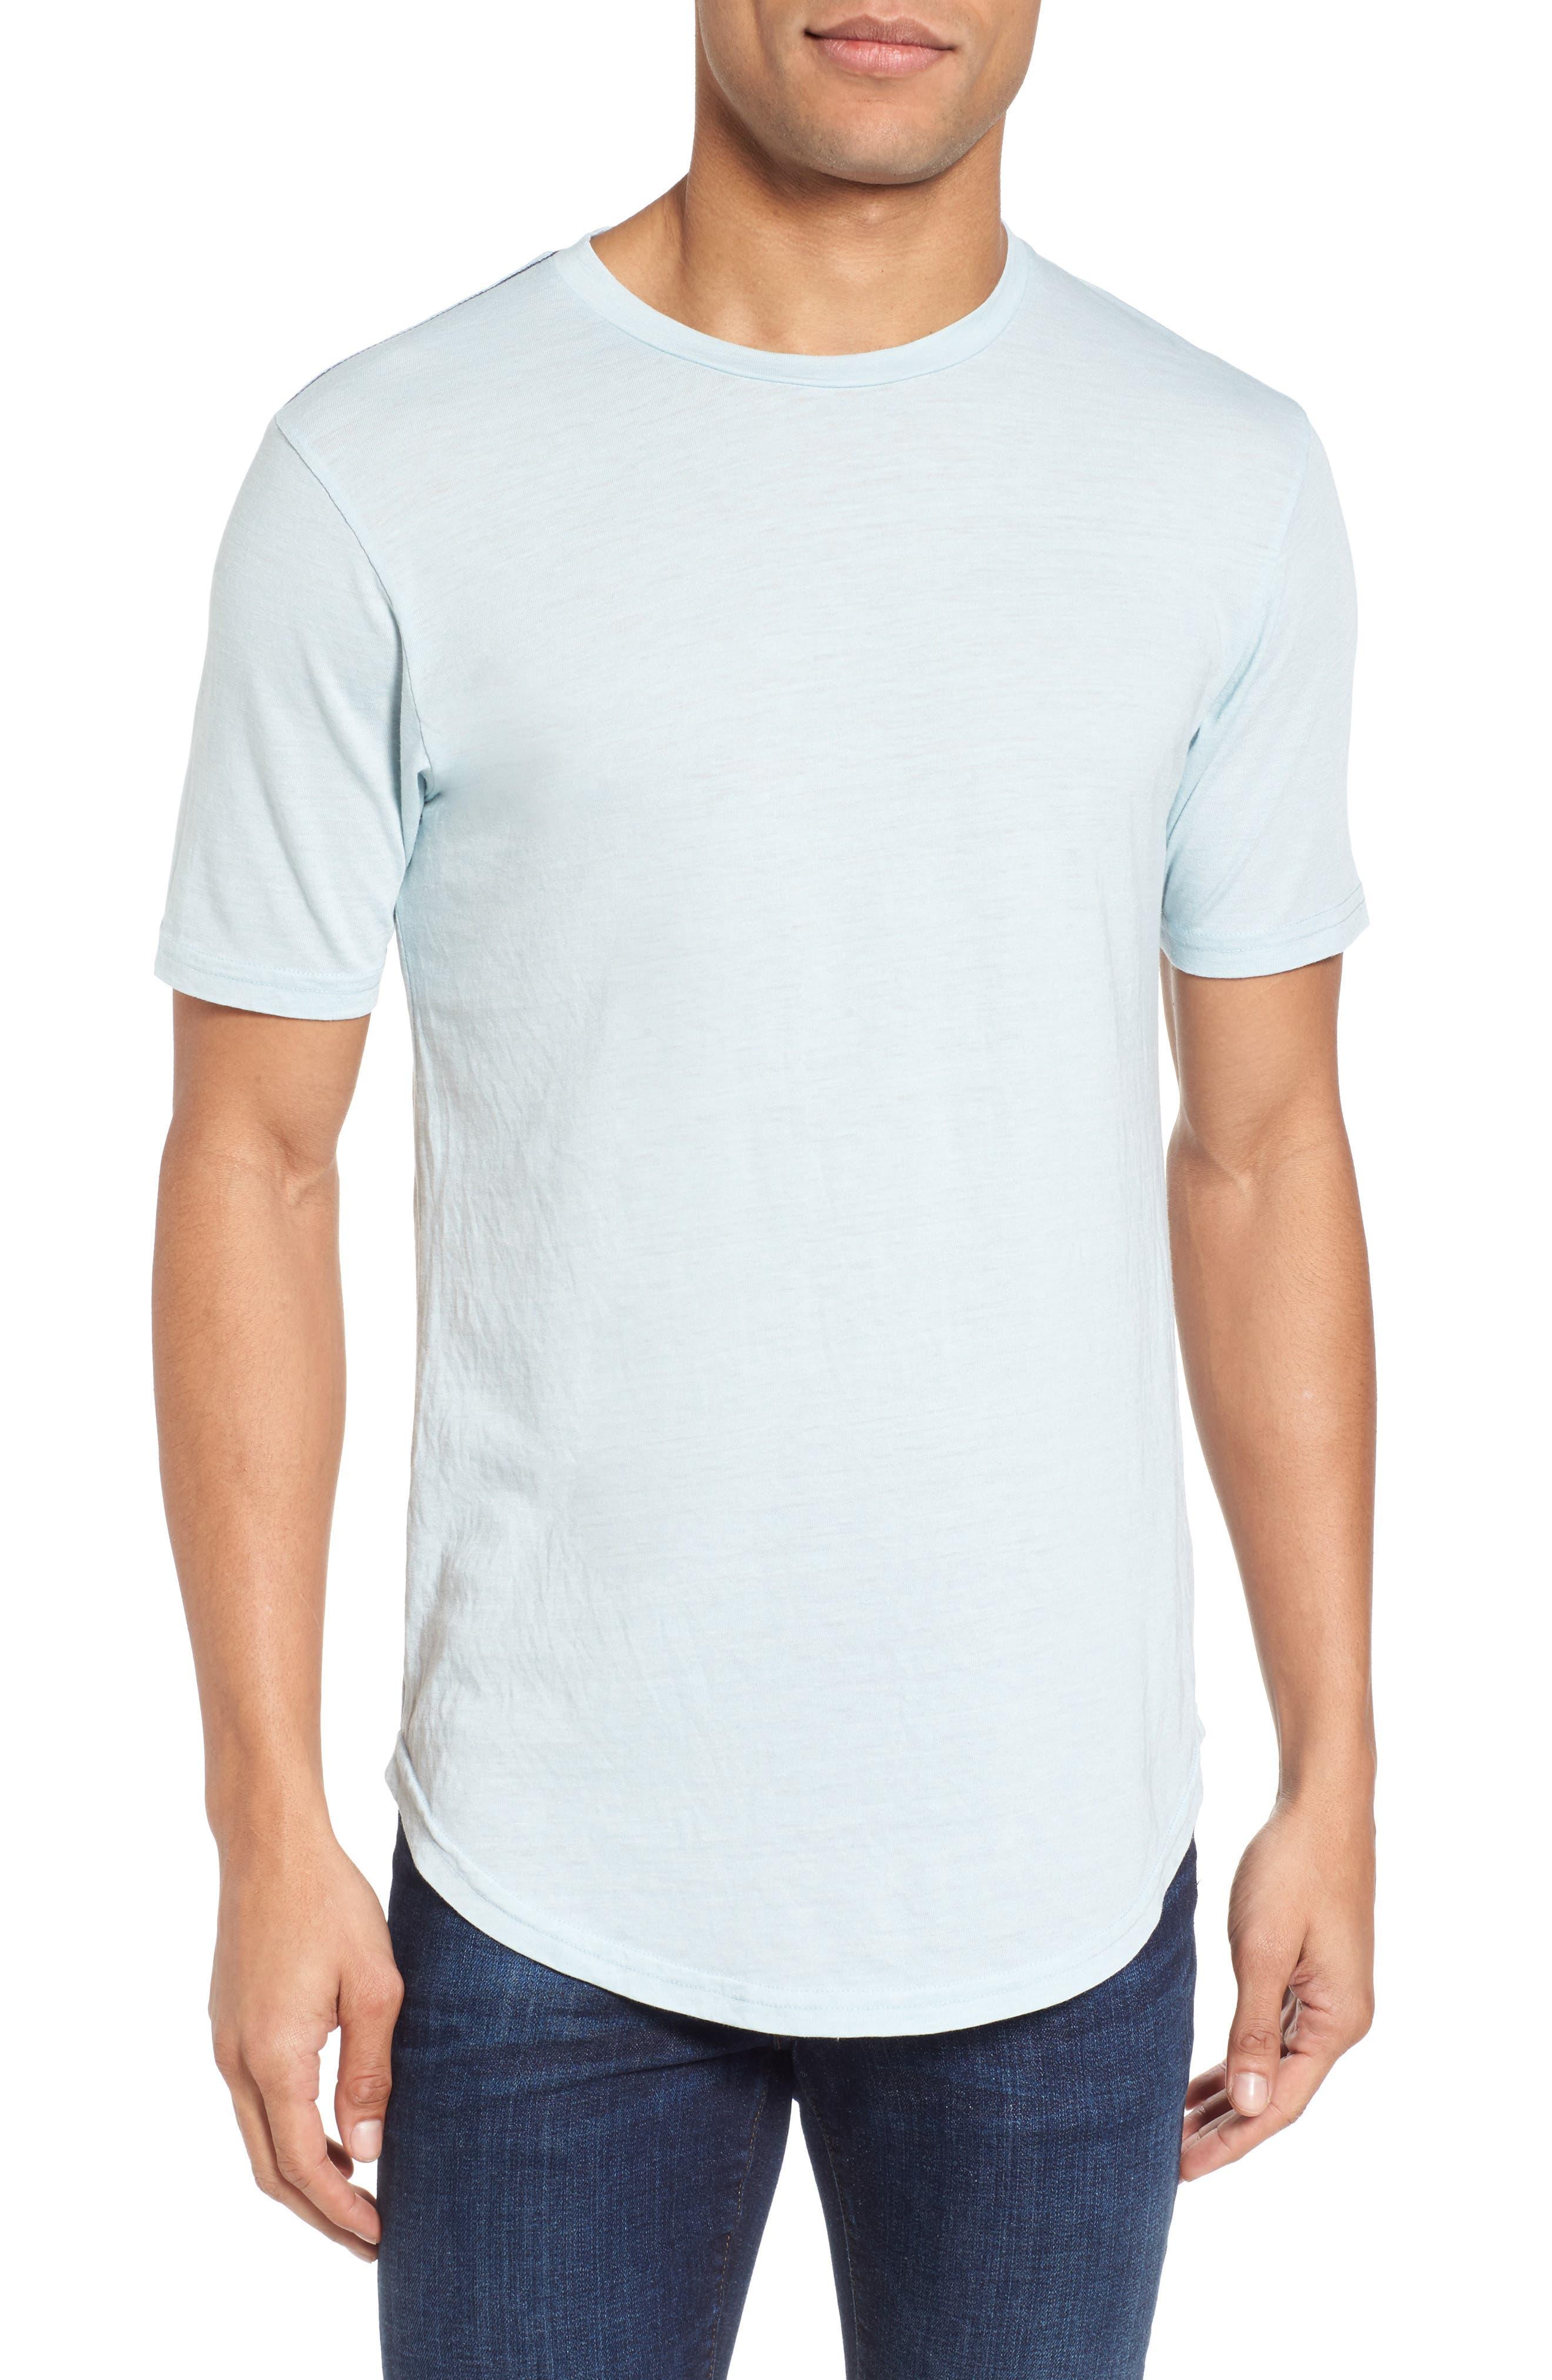 Goodlife Scallop Triblend Crewneck T-Shirt